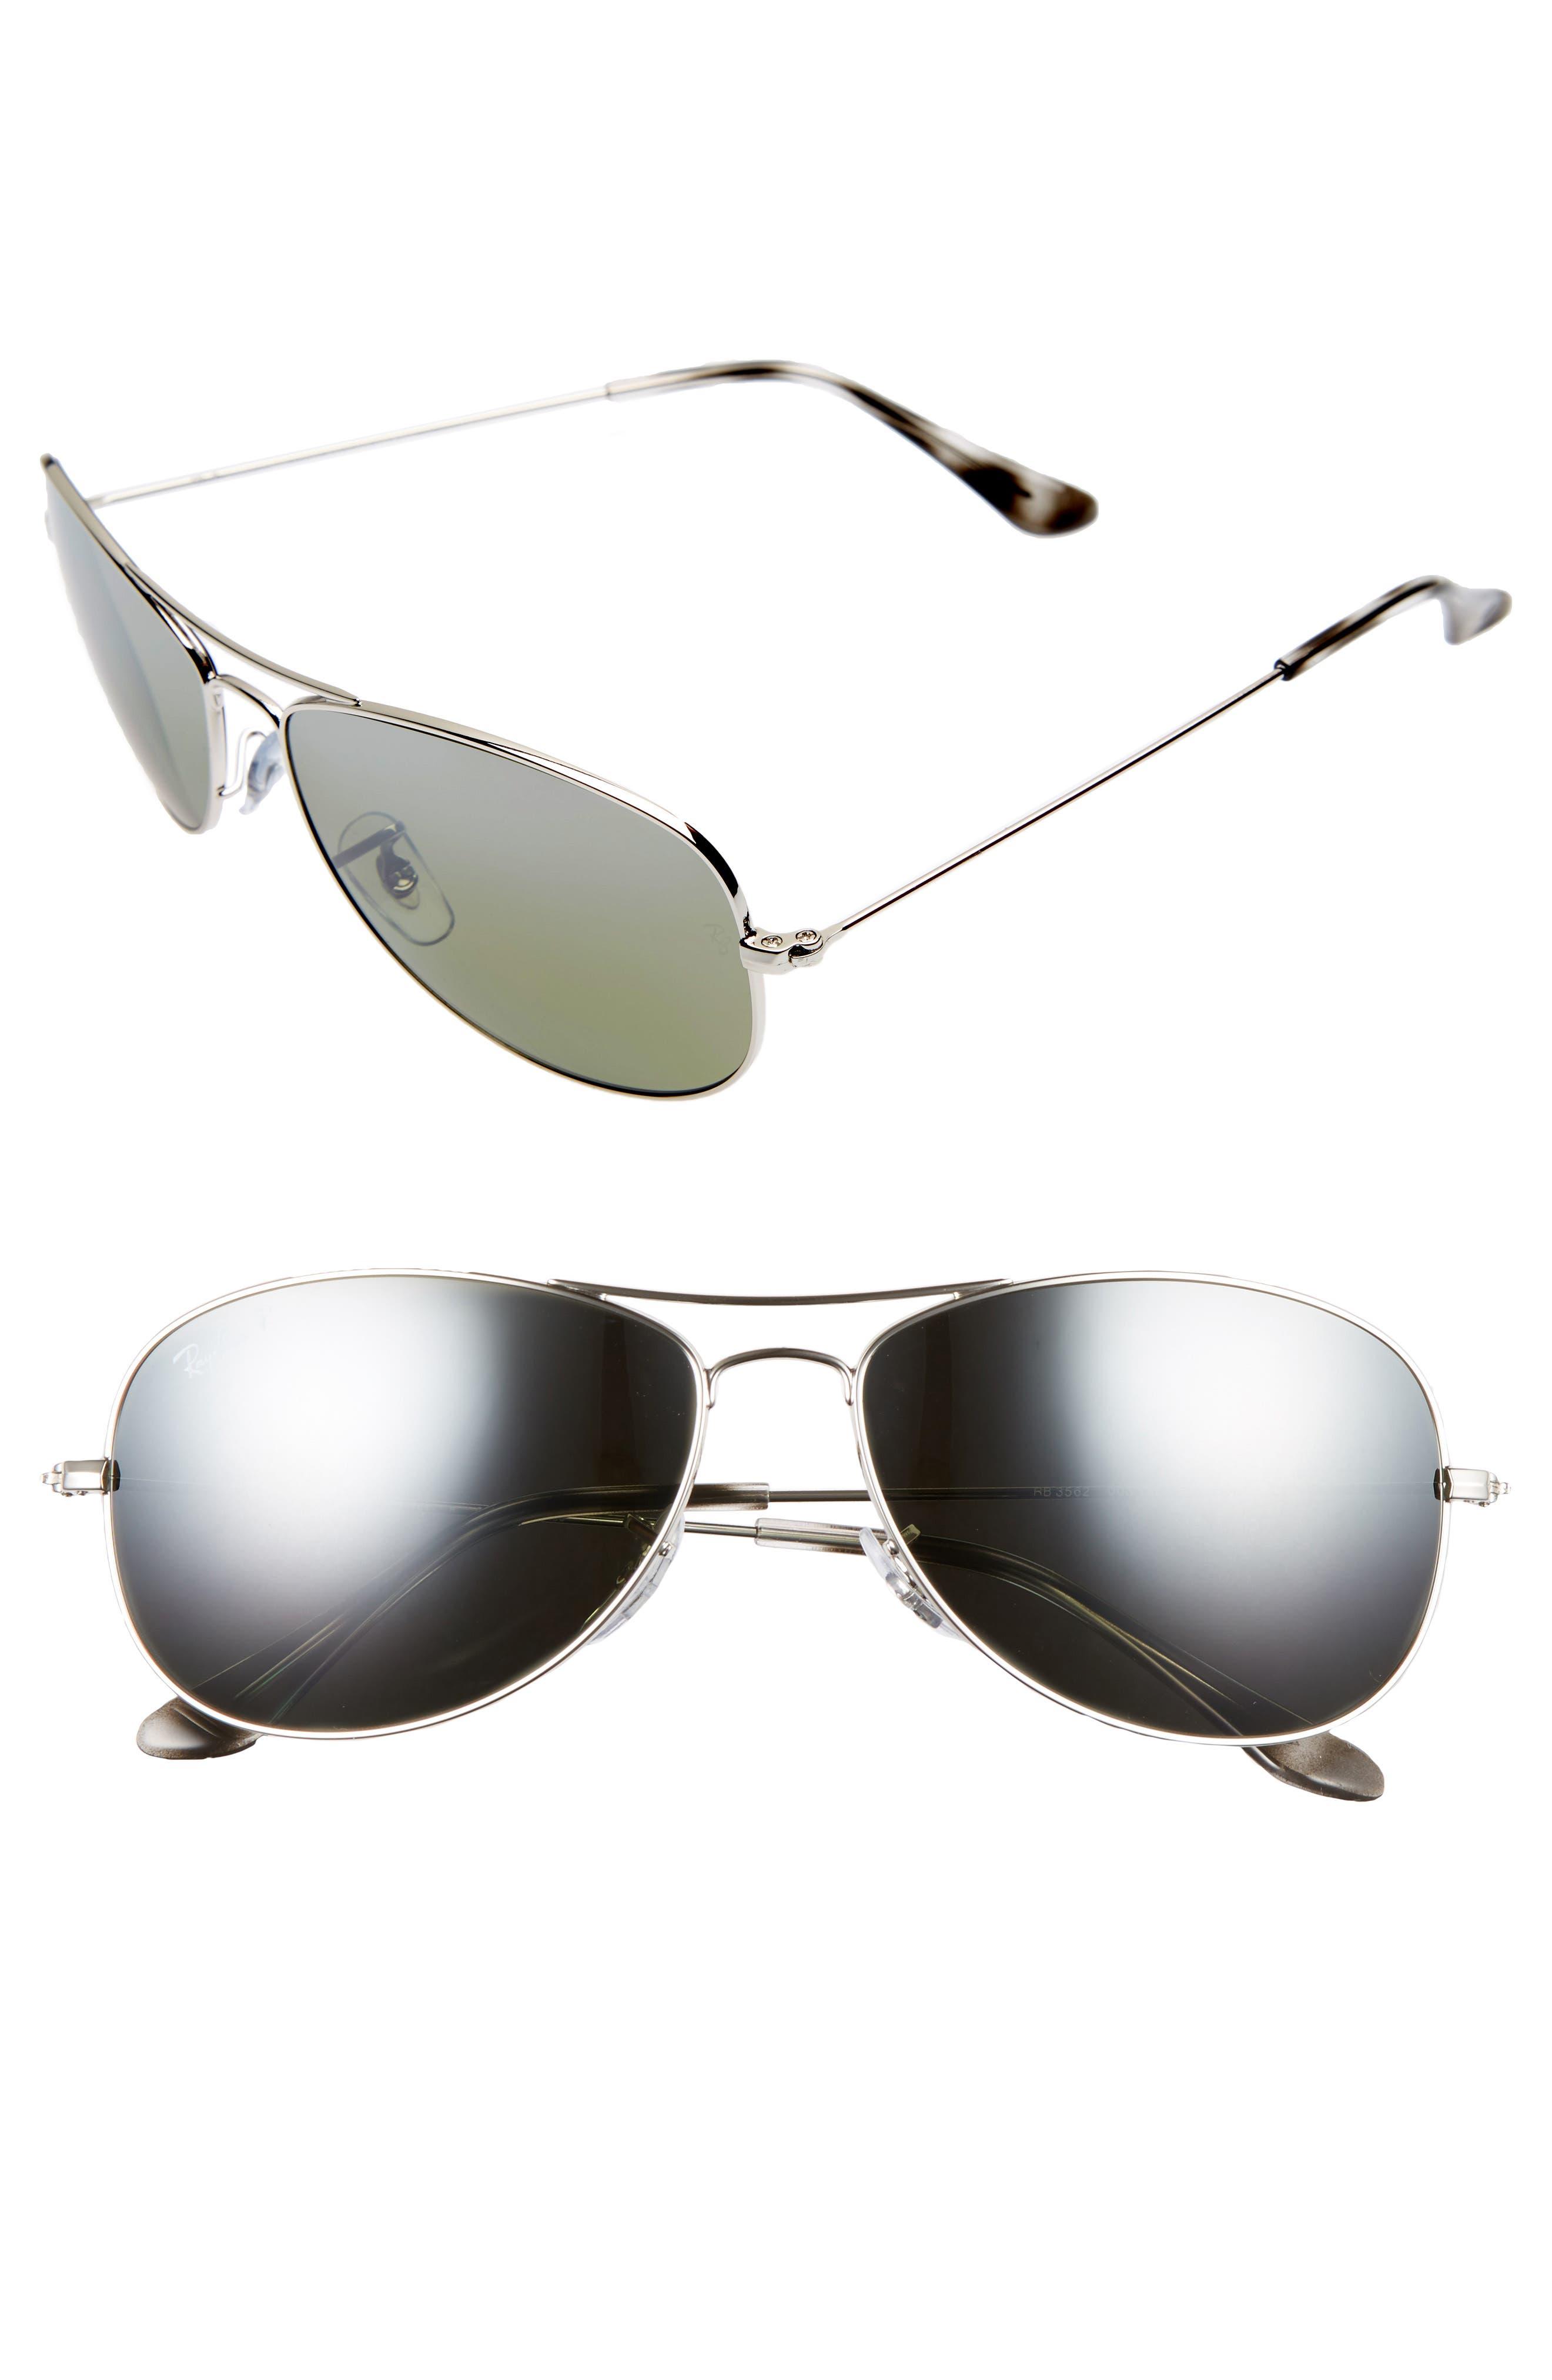 59mm Polarized Aviator Sunglasses,                         Main,                         color, Grey/ Mirror